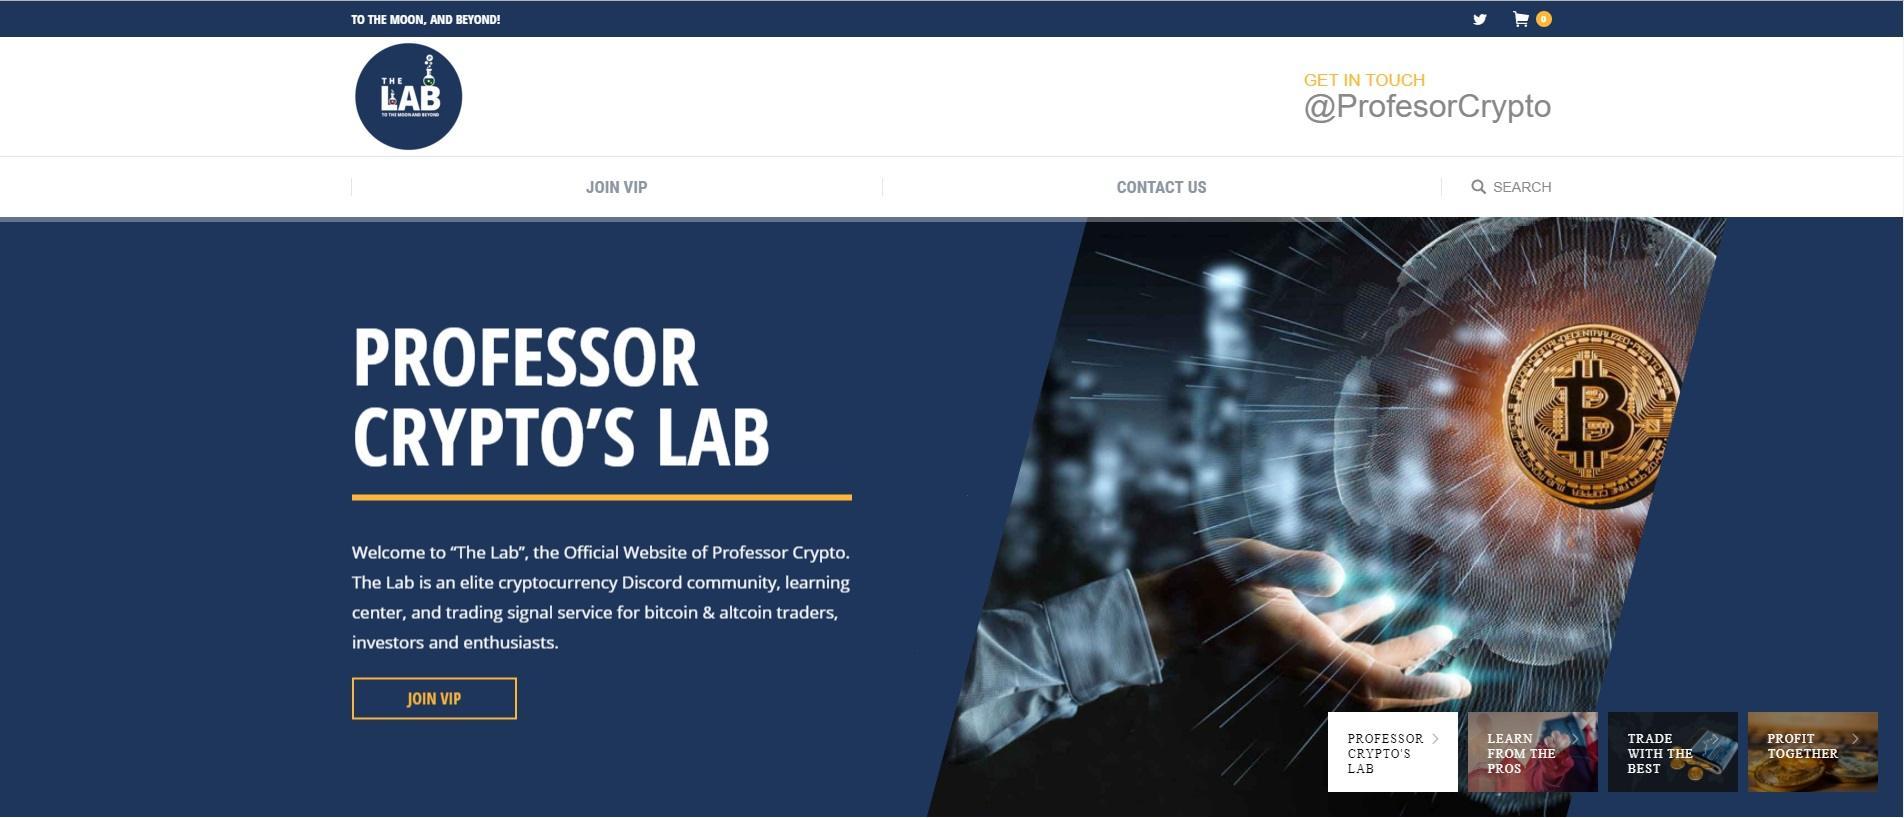 @ProfessorCrypto's Lab